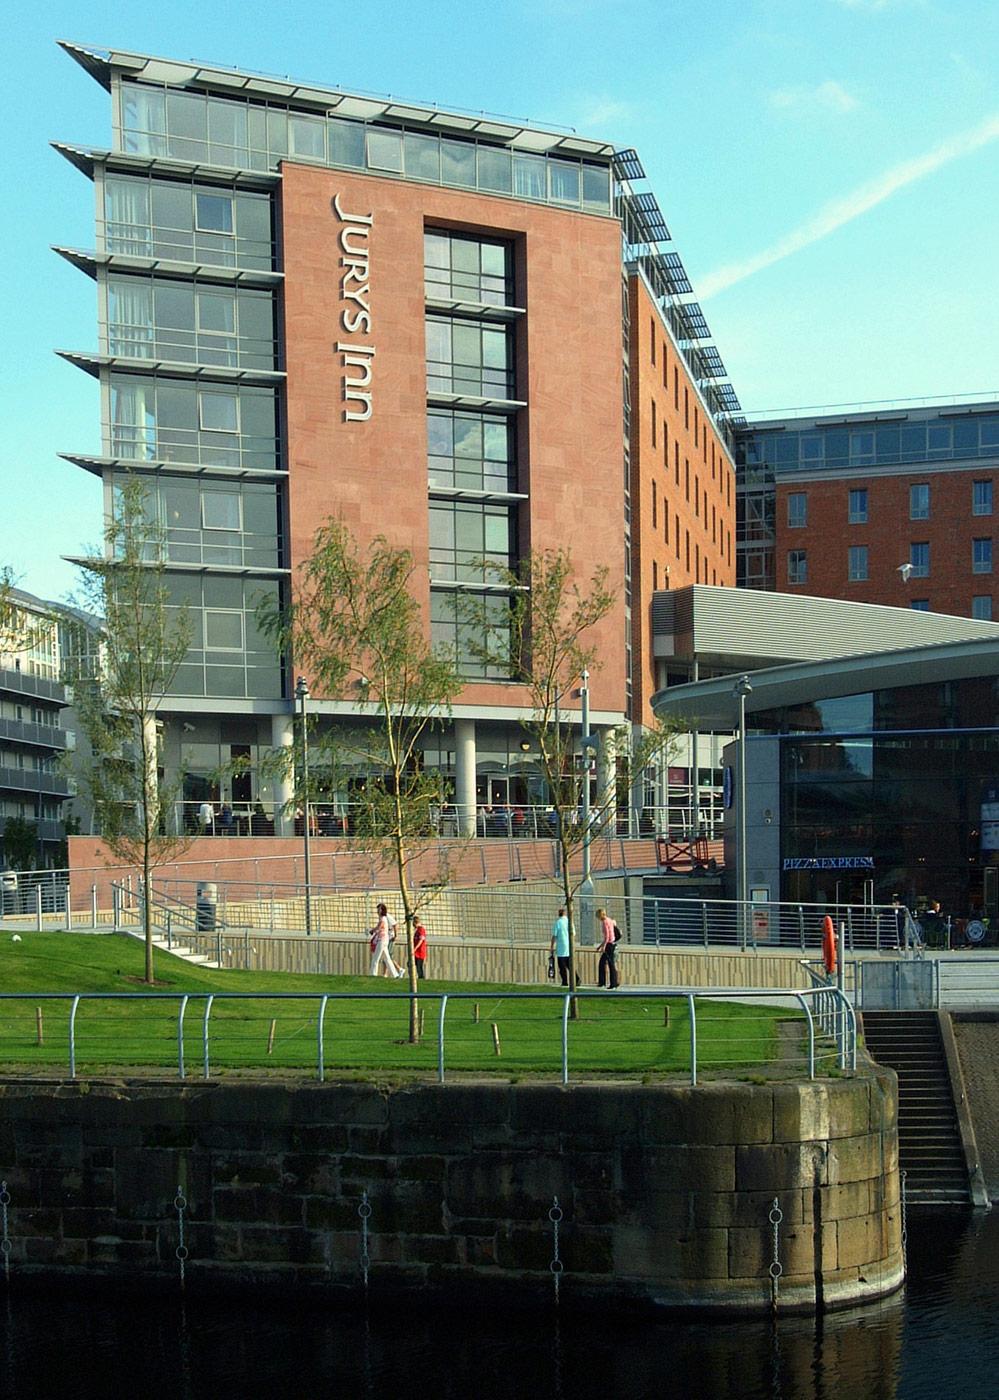 Jurys Hotel Liverpool